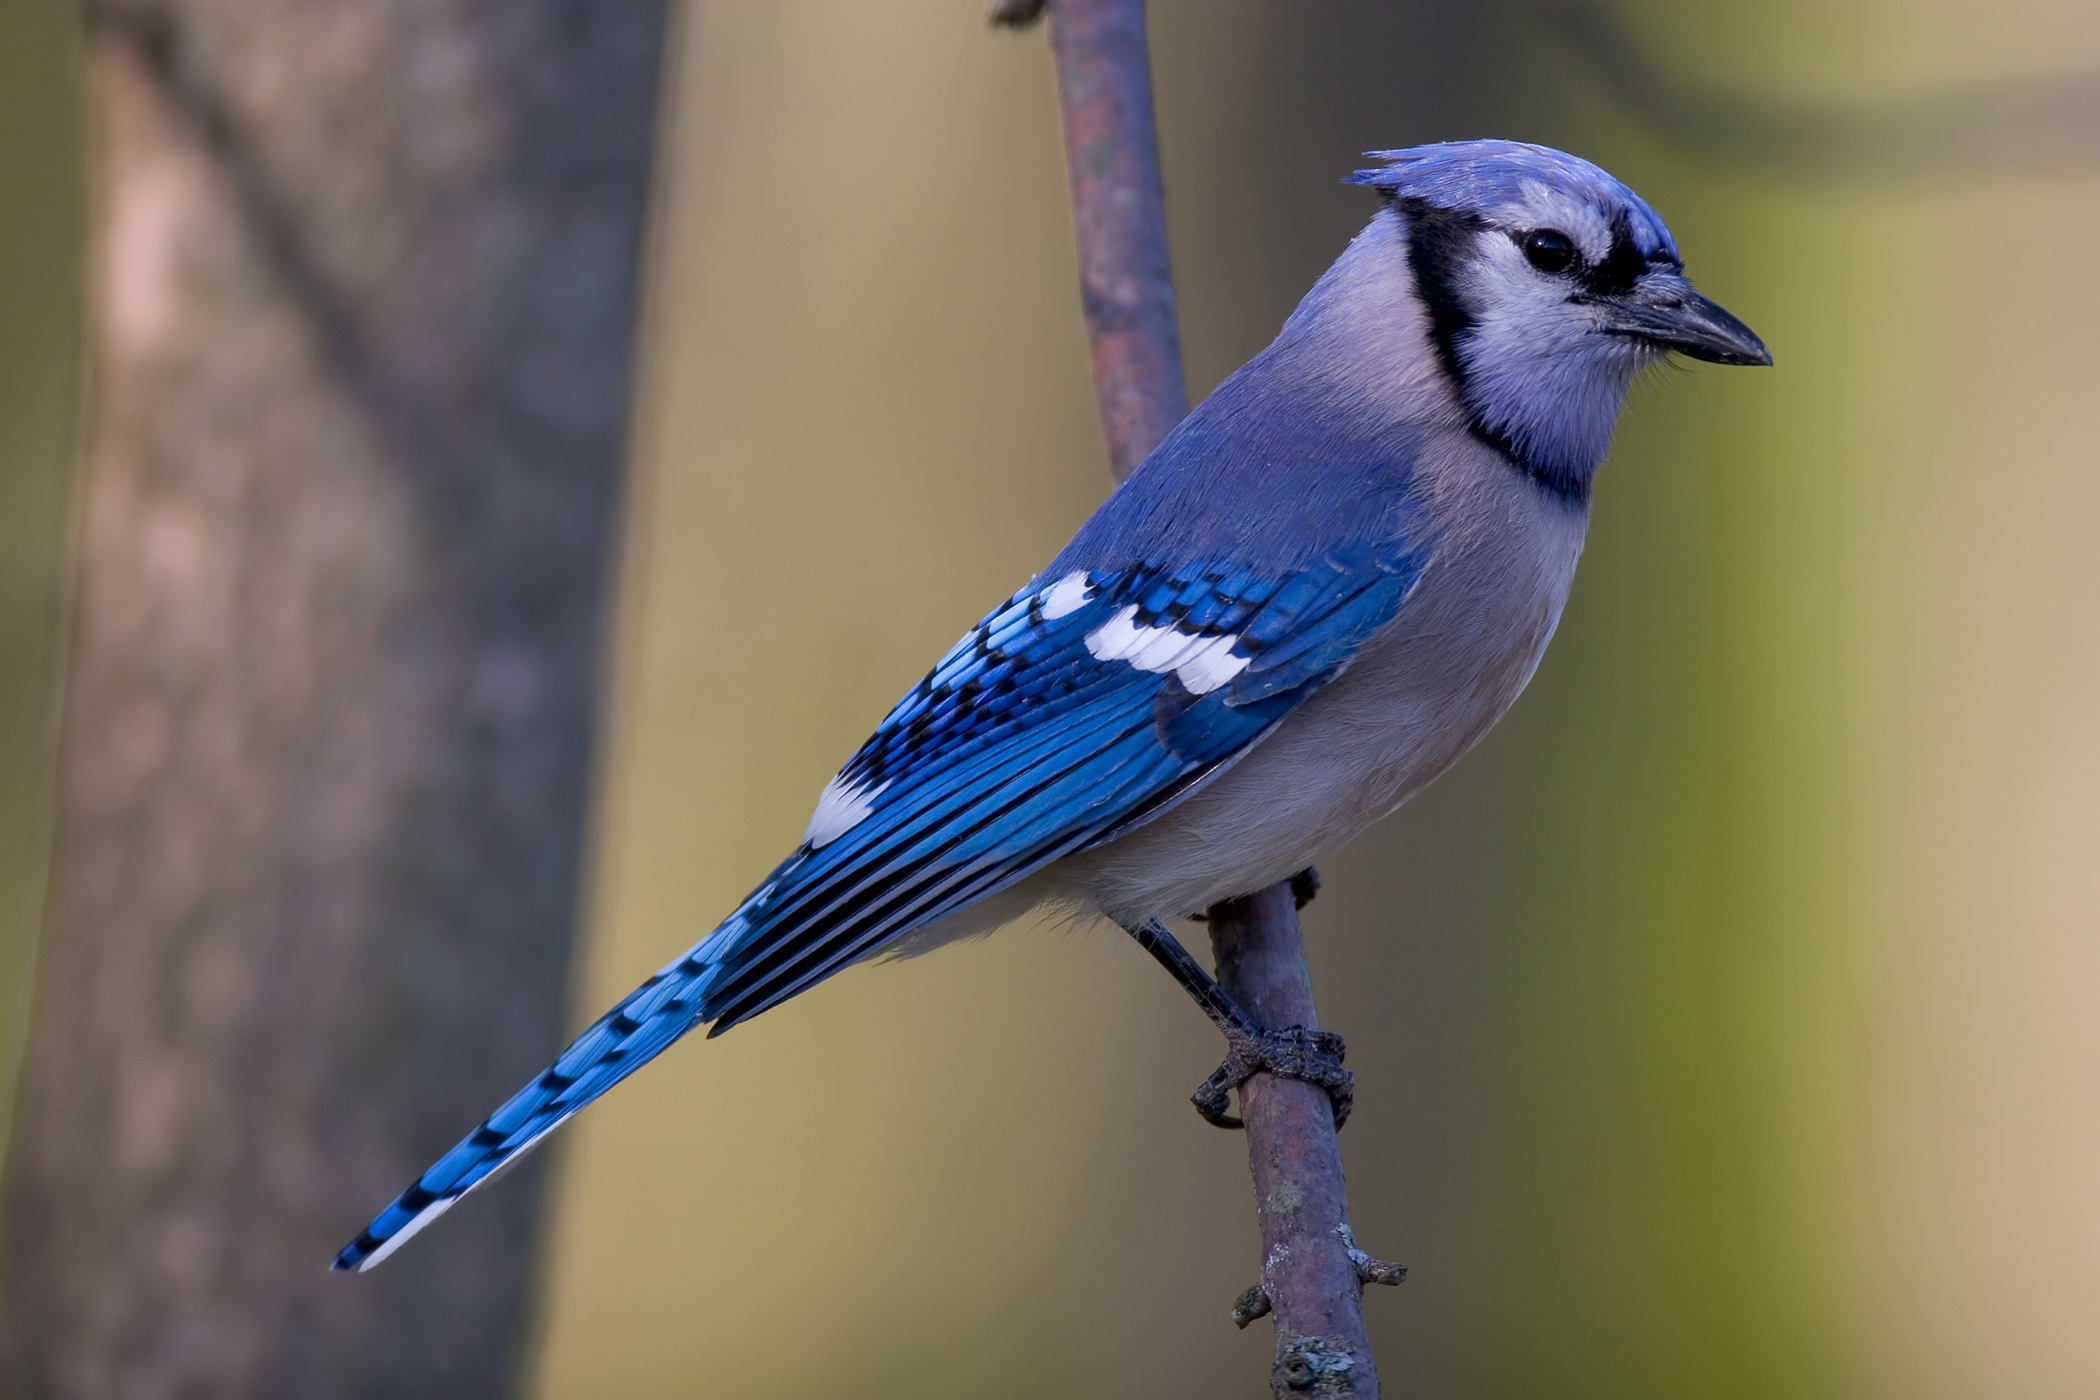 Lead Poisoning in Birds